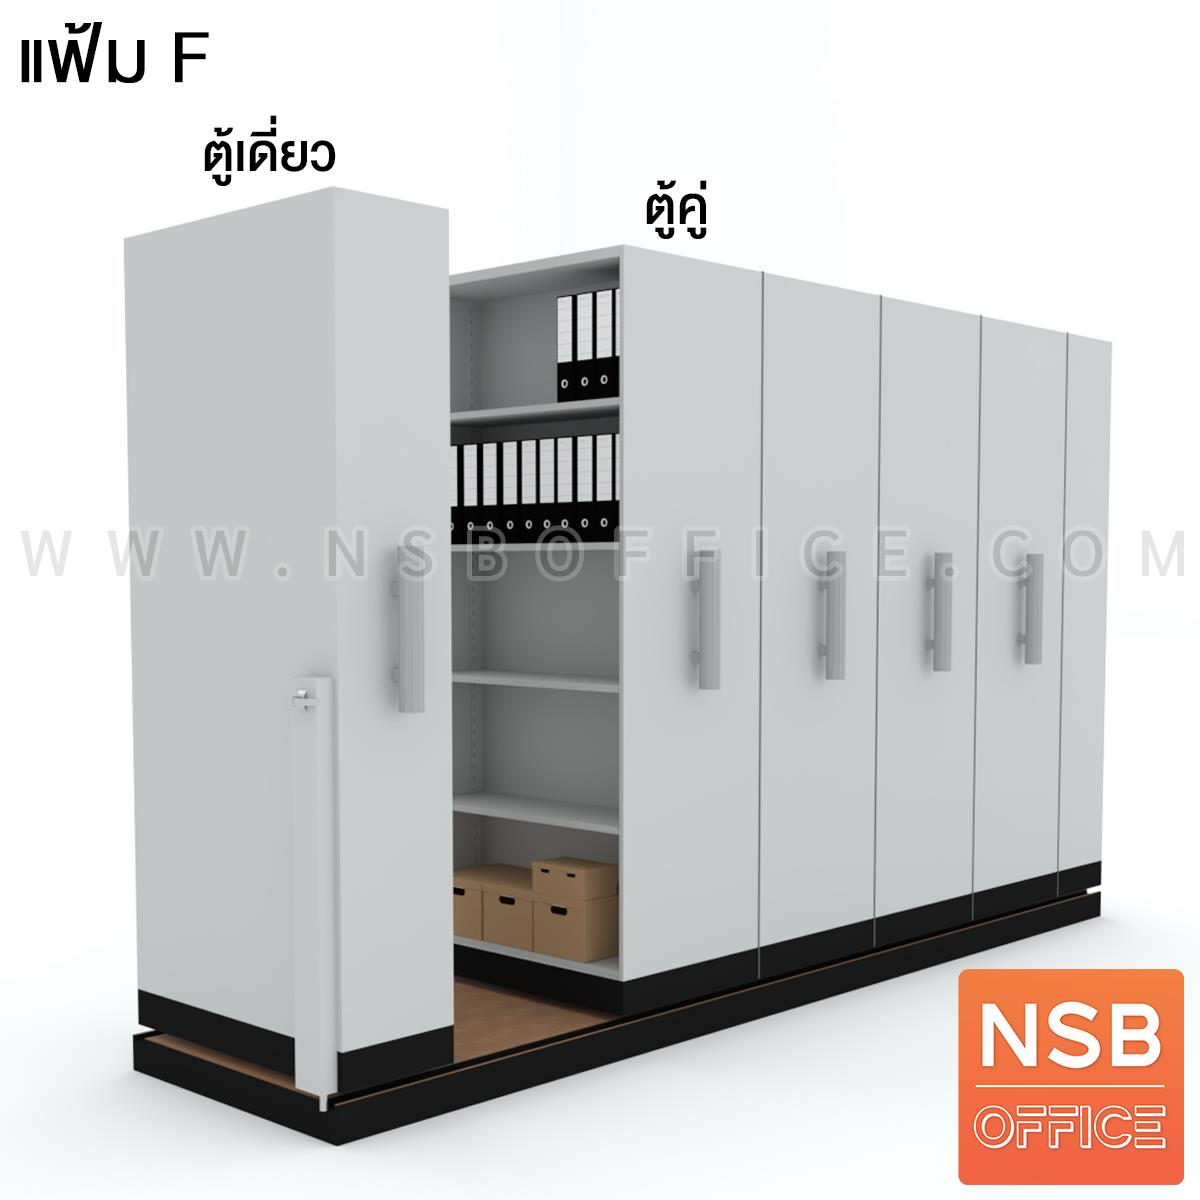 D02A001:ตู้รางเลื่อนมือผลัก 91.4D cm  ขนาด 4, 6, 8, 10,12,14,16 ตู้